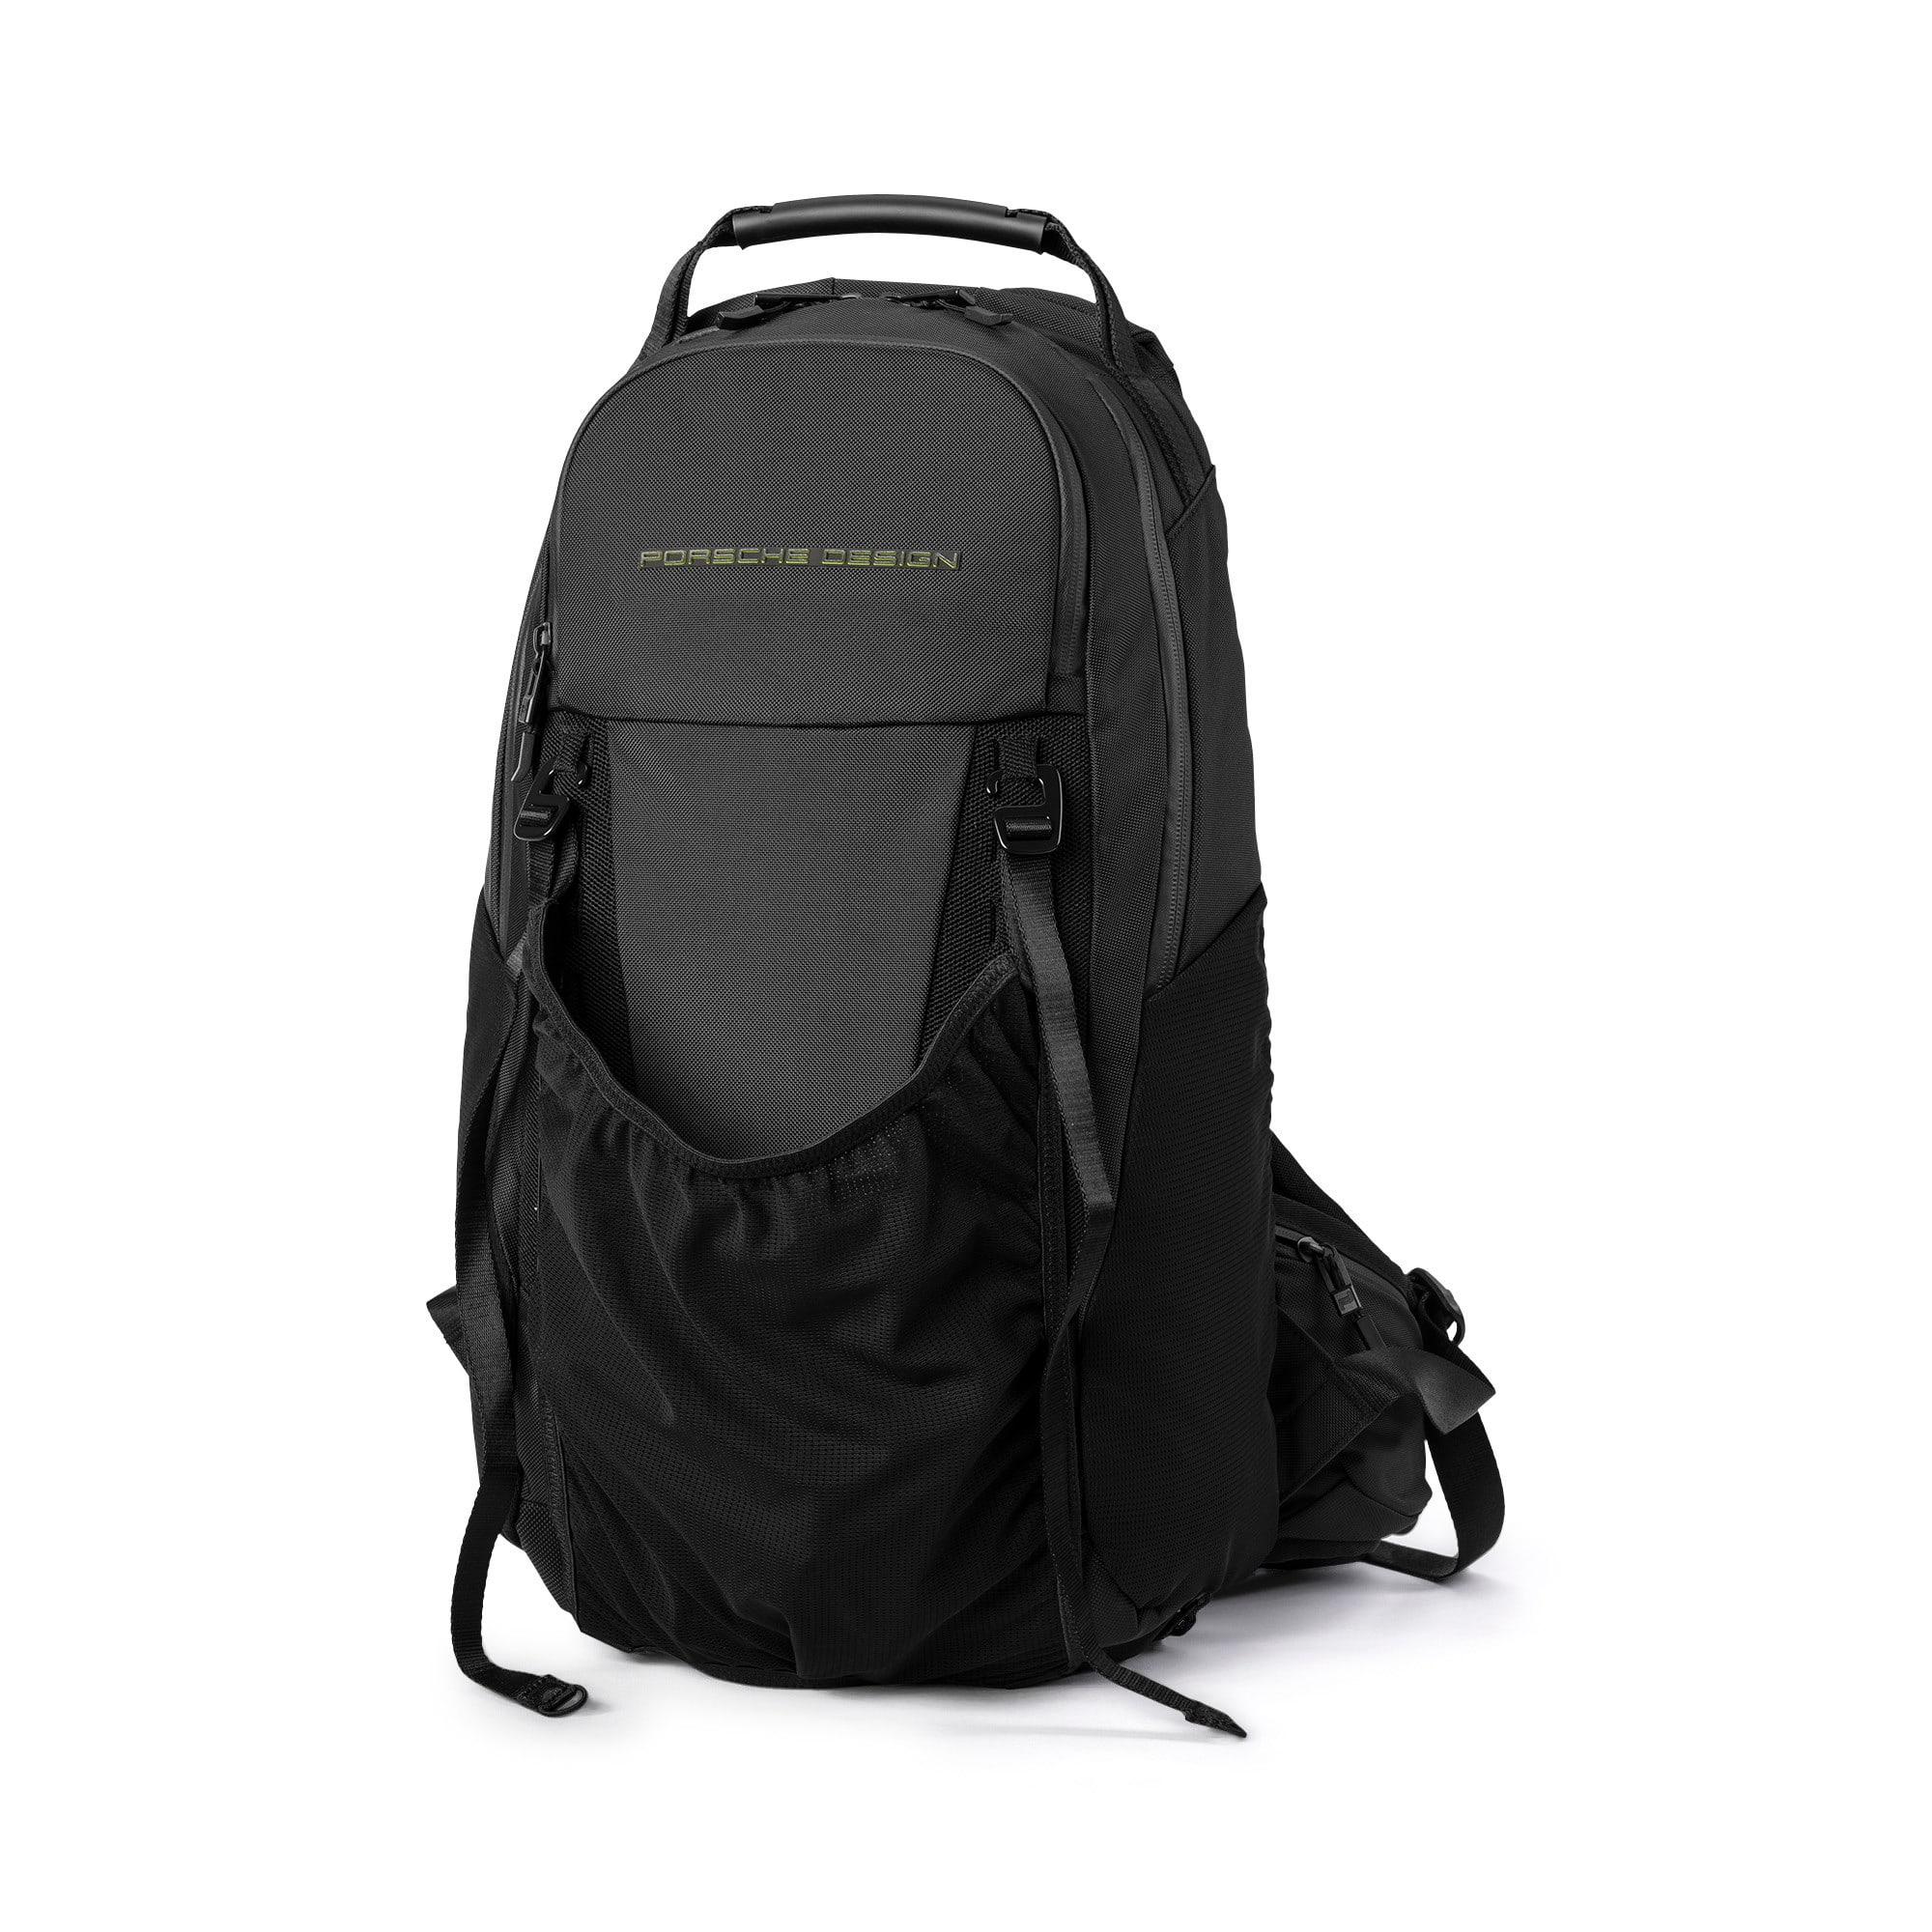 Thumbnail 5 of Porsche Design evoKNIT Active Backpack, Puma Black, medium